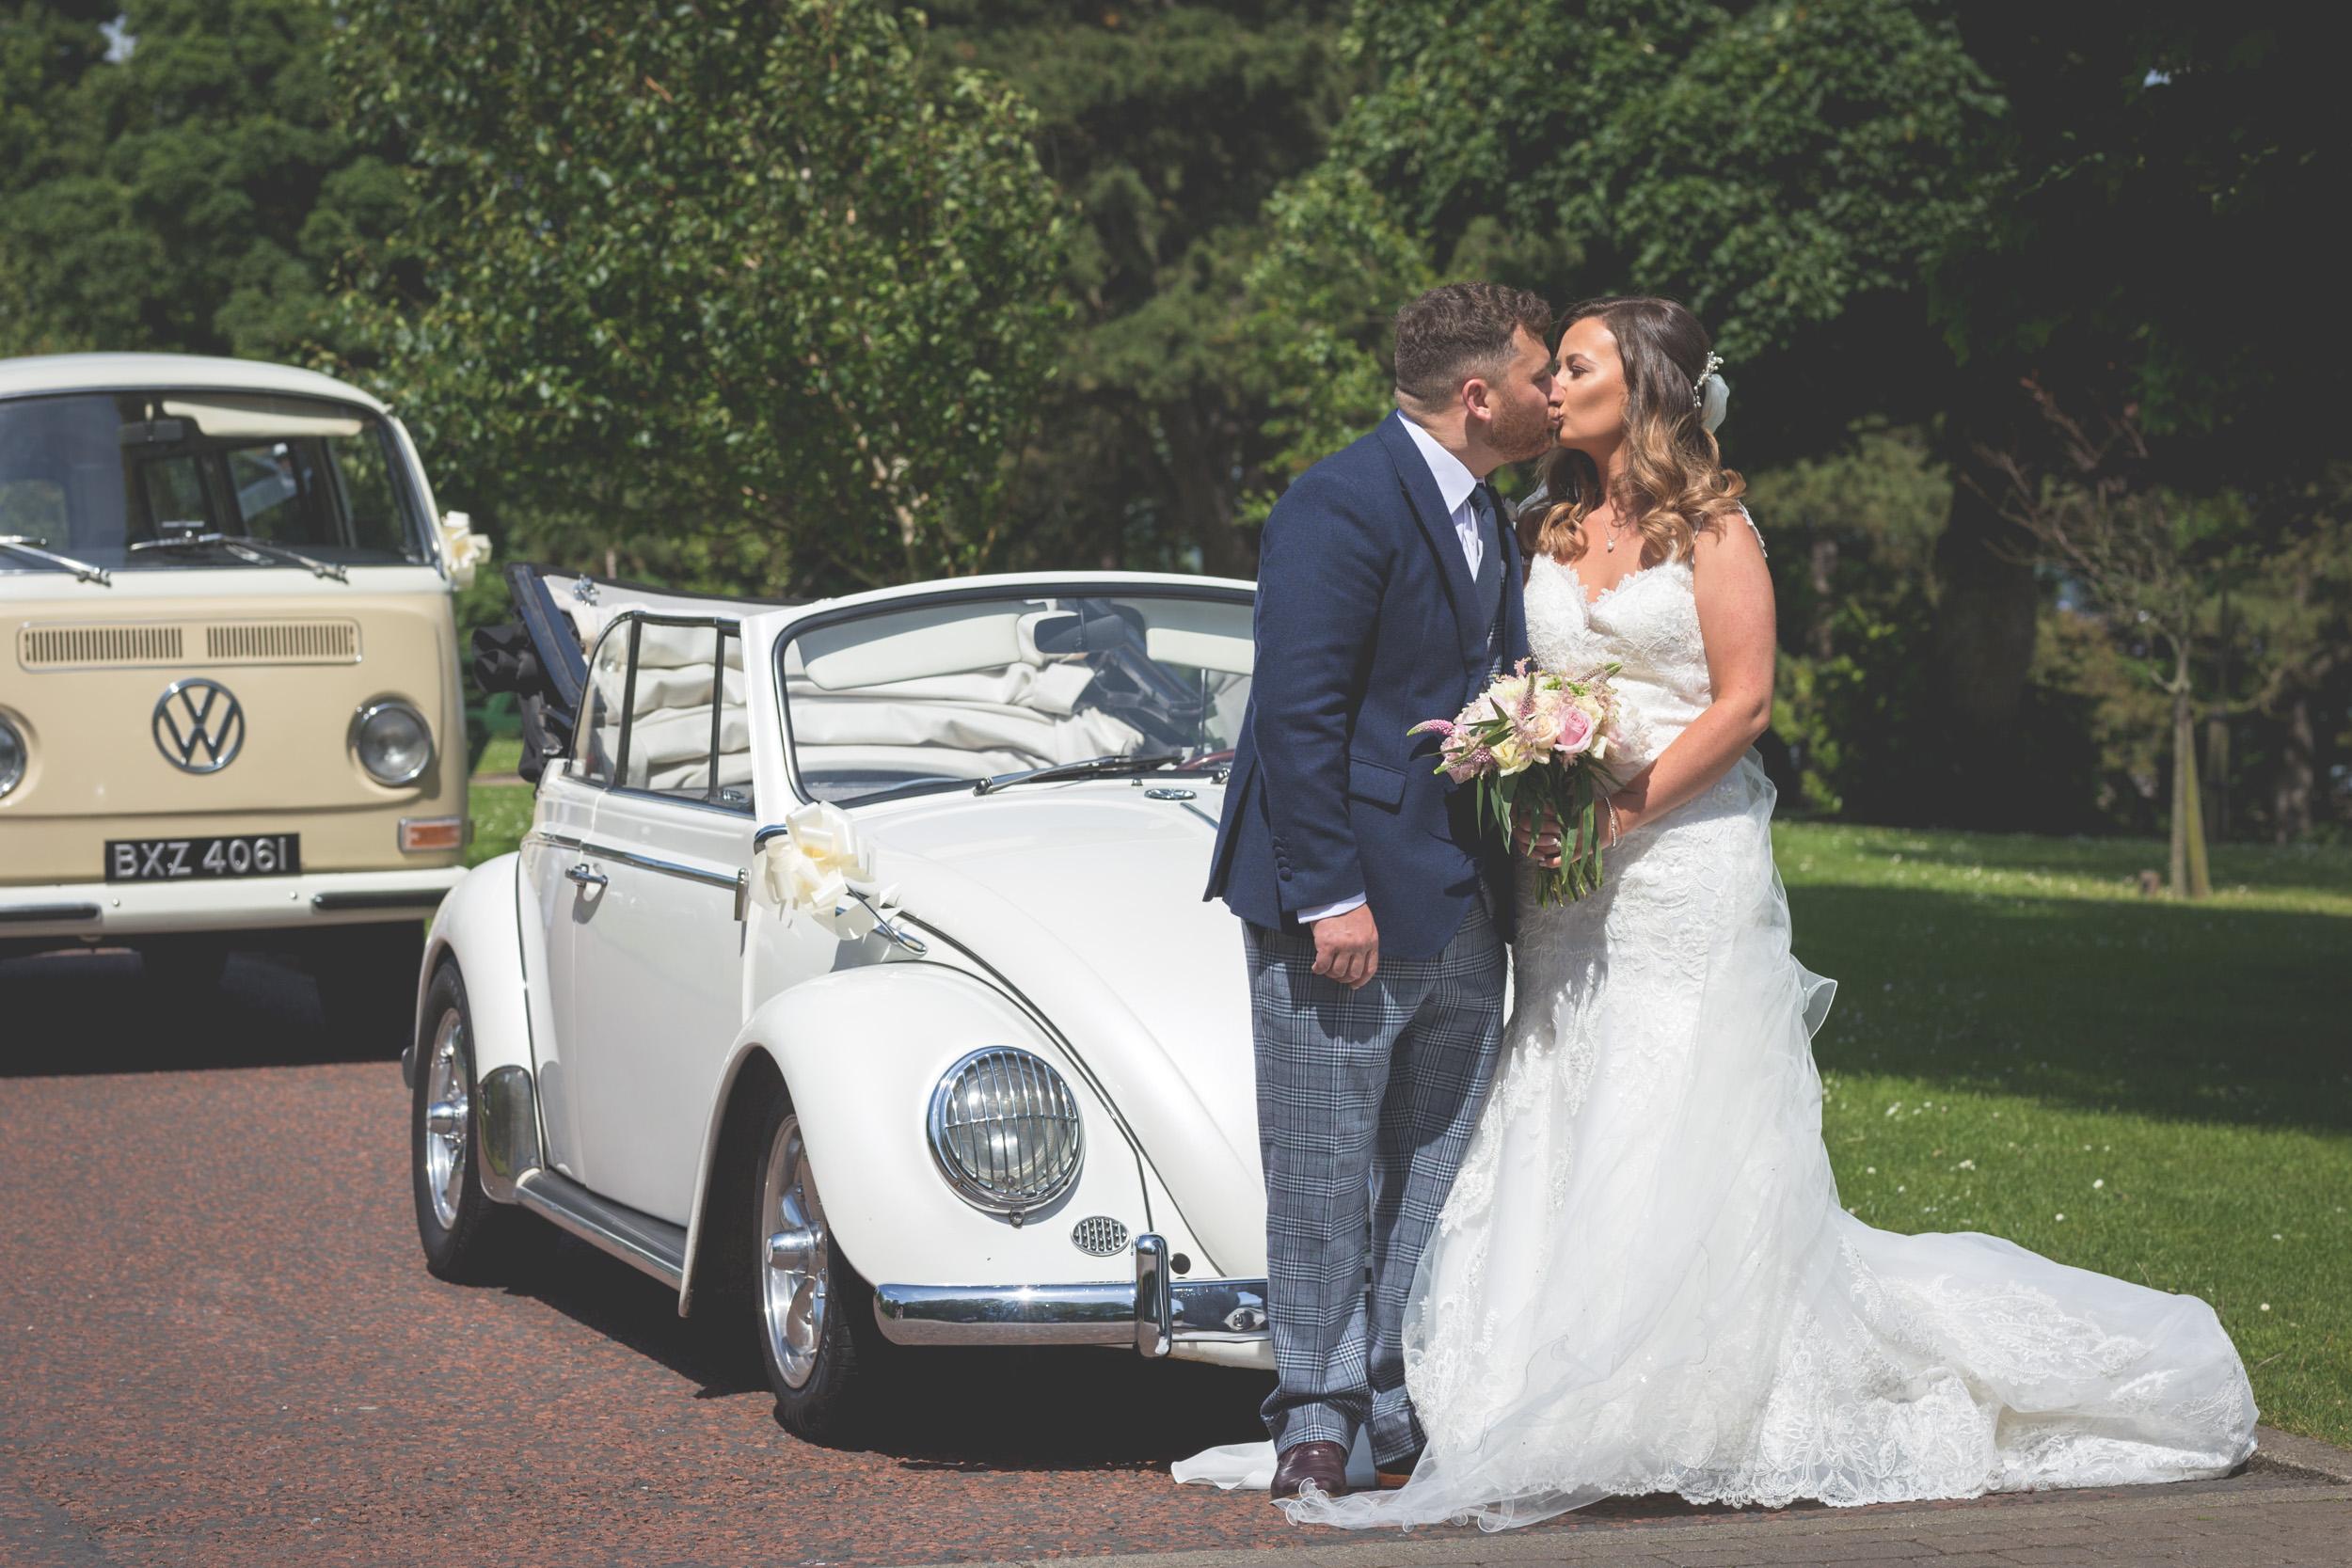 Brian McEwan   Northern Ireland Wedding Photographer   Rebecca & Michael   Portraits-16.jpg